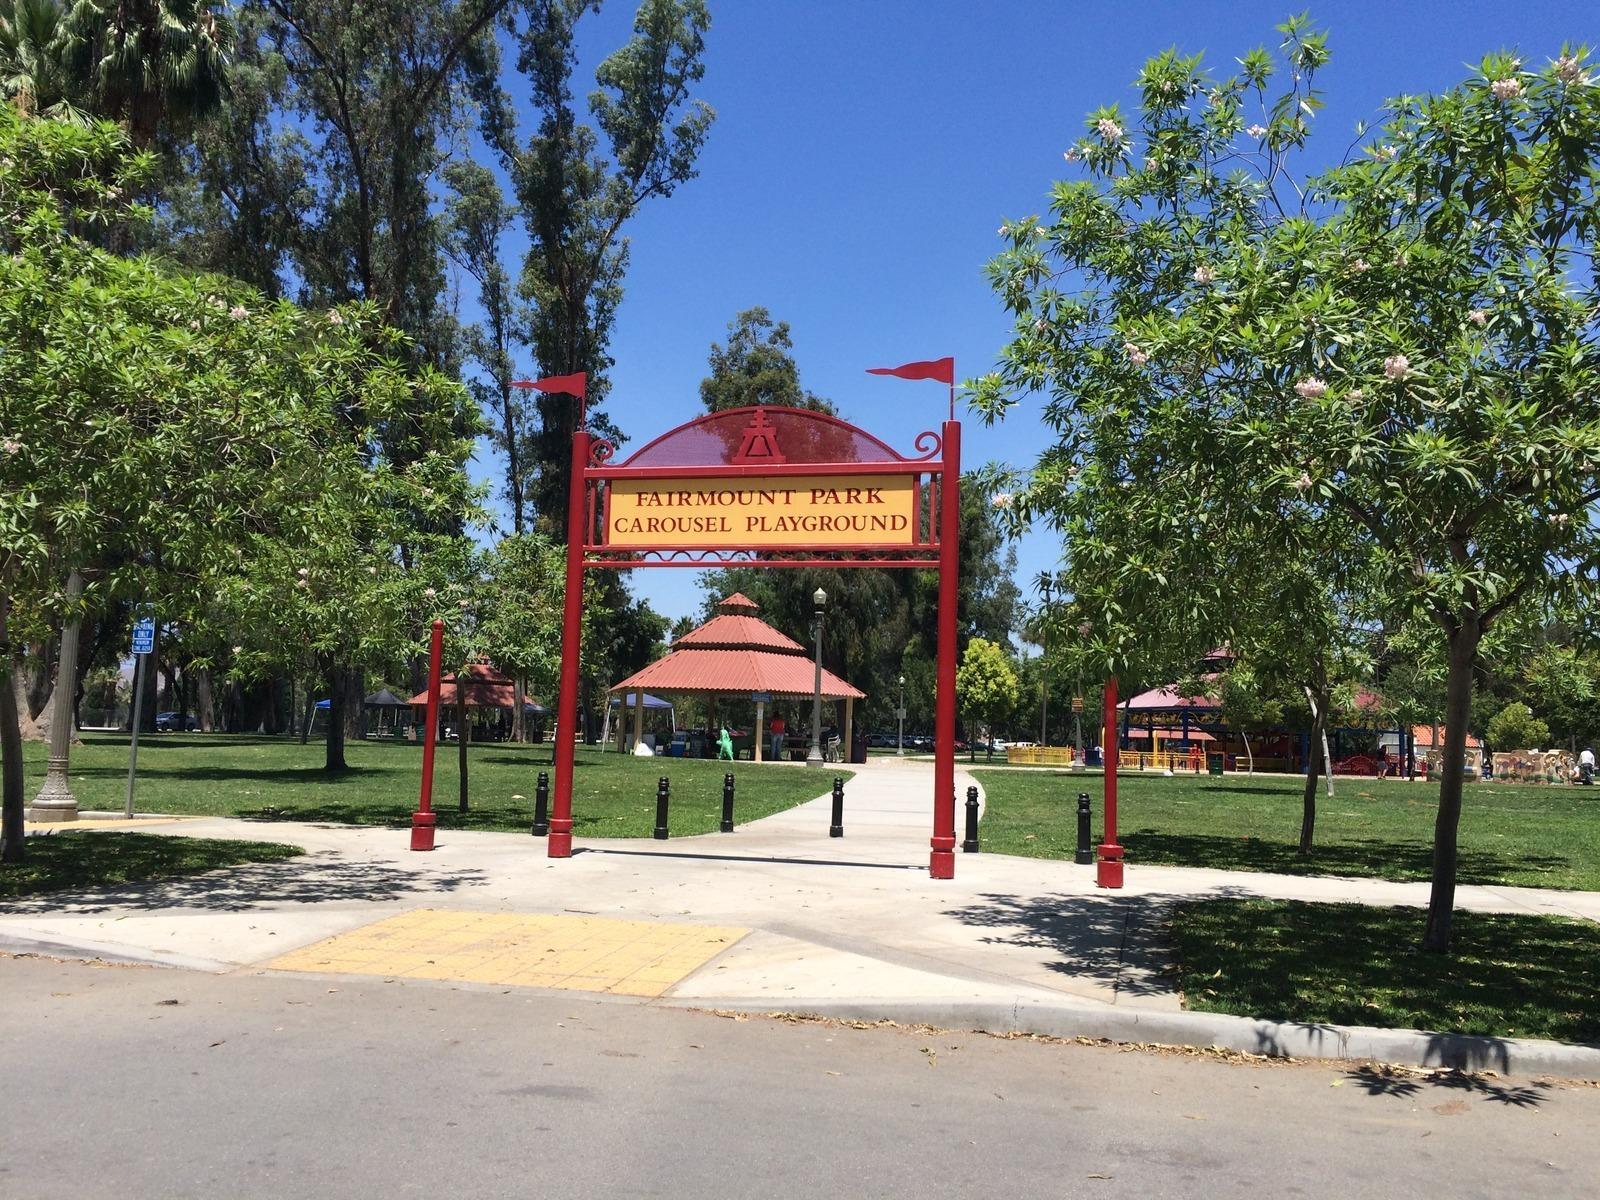 Fairmount Park Riverside California Map.Fairmount Park In Riverside Ca Kid Friendly Attractions Trekaroo